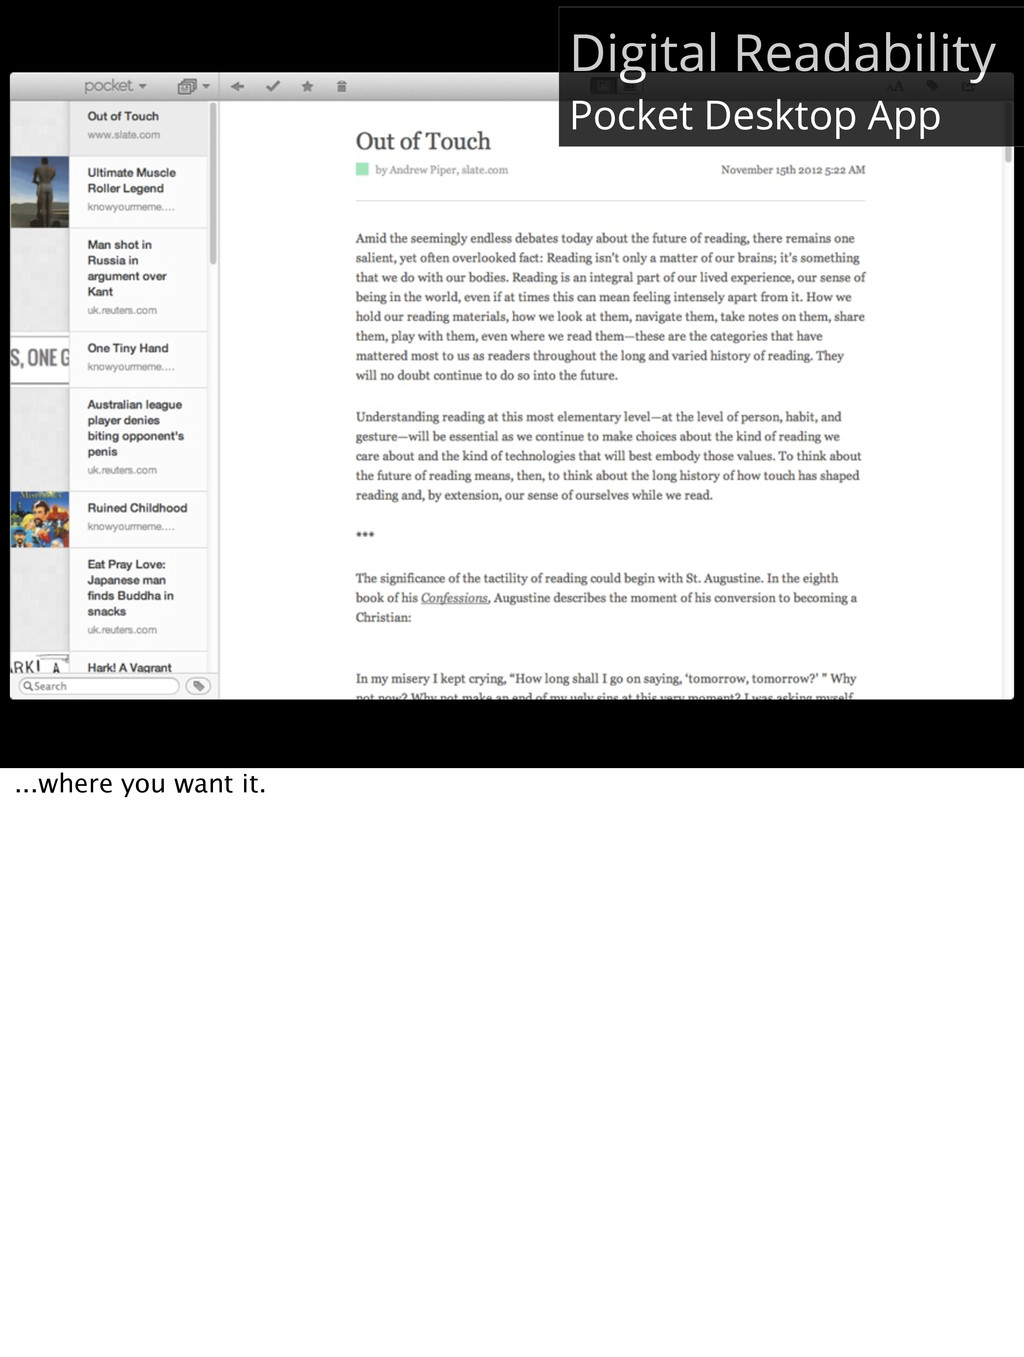 Digital Readability Pocket Desktop App ...where...